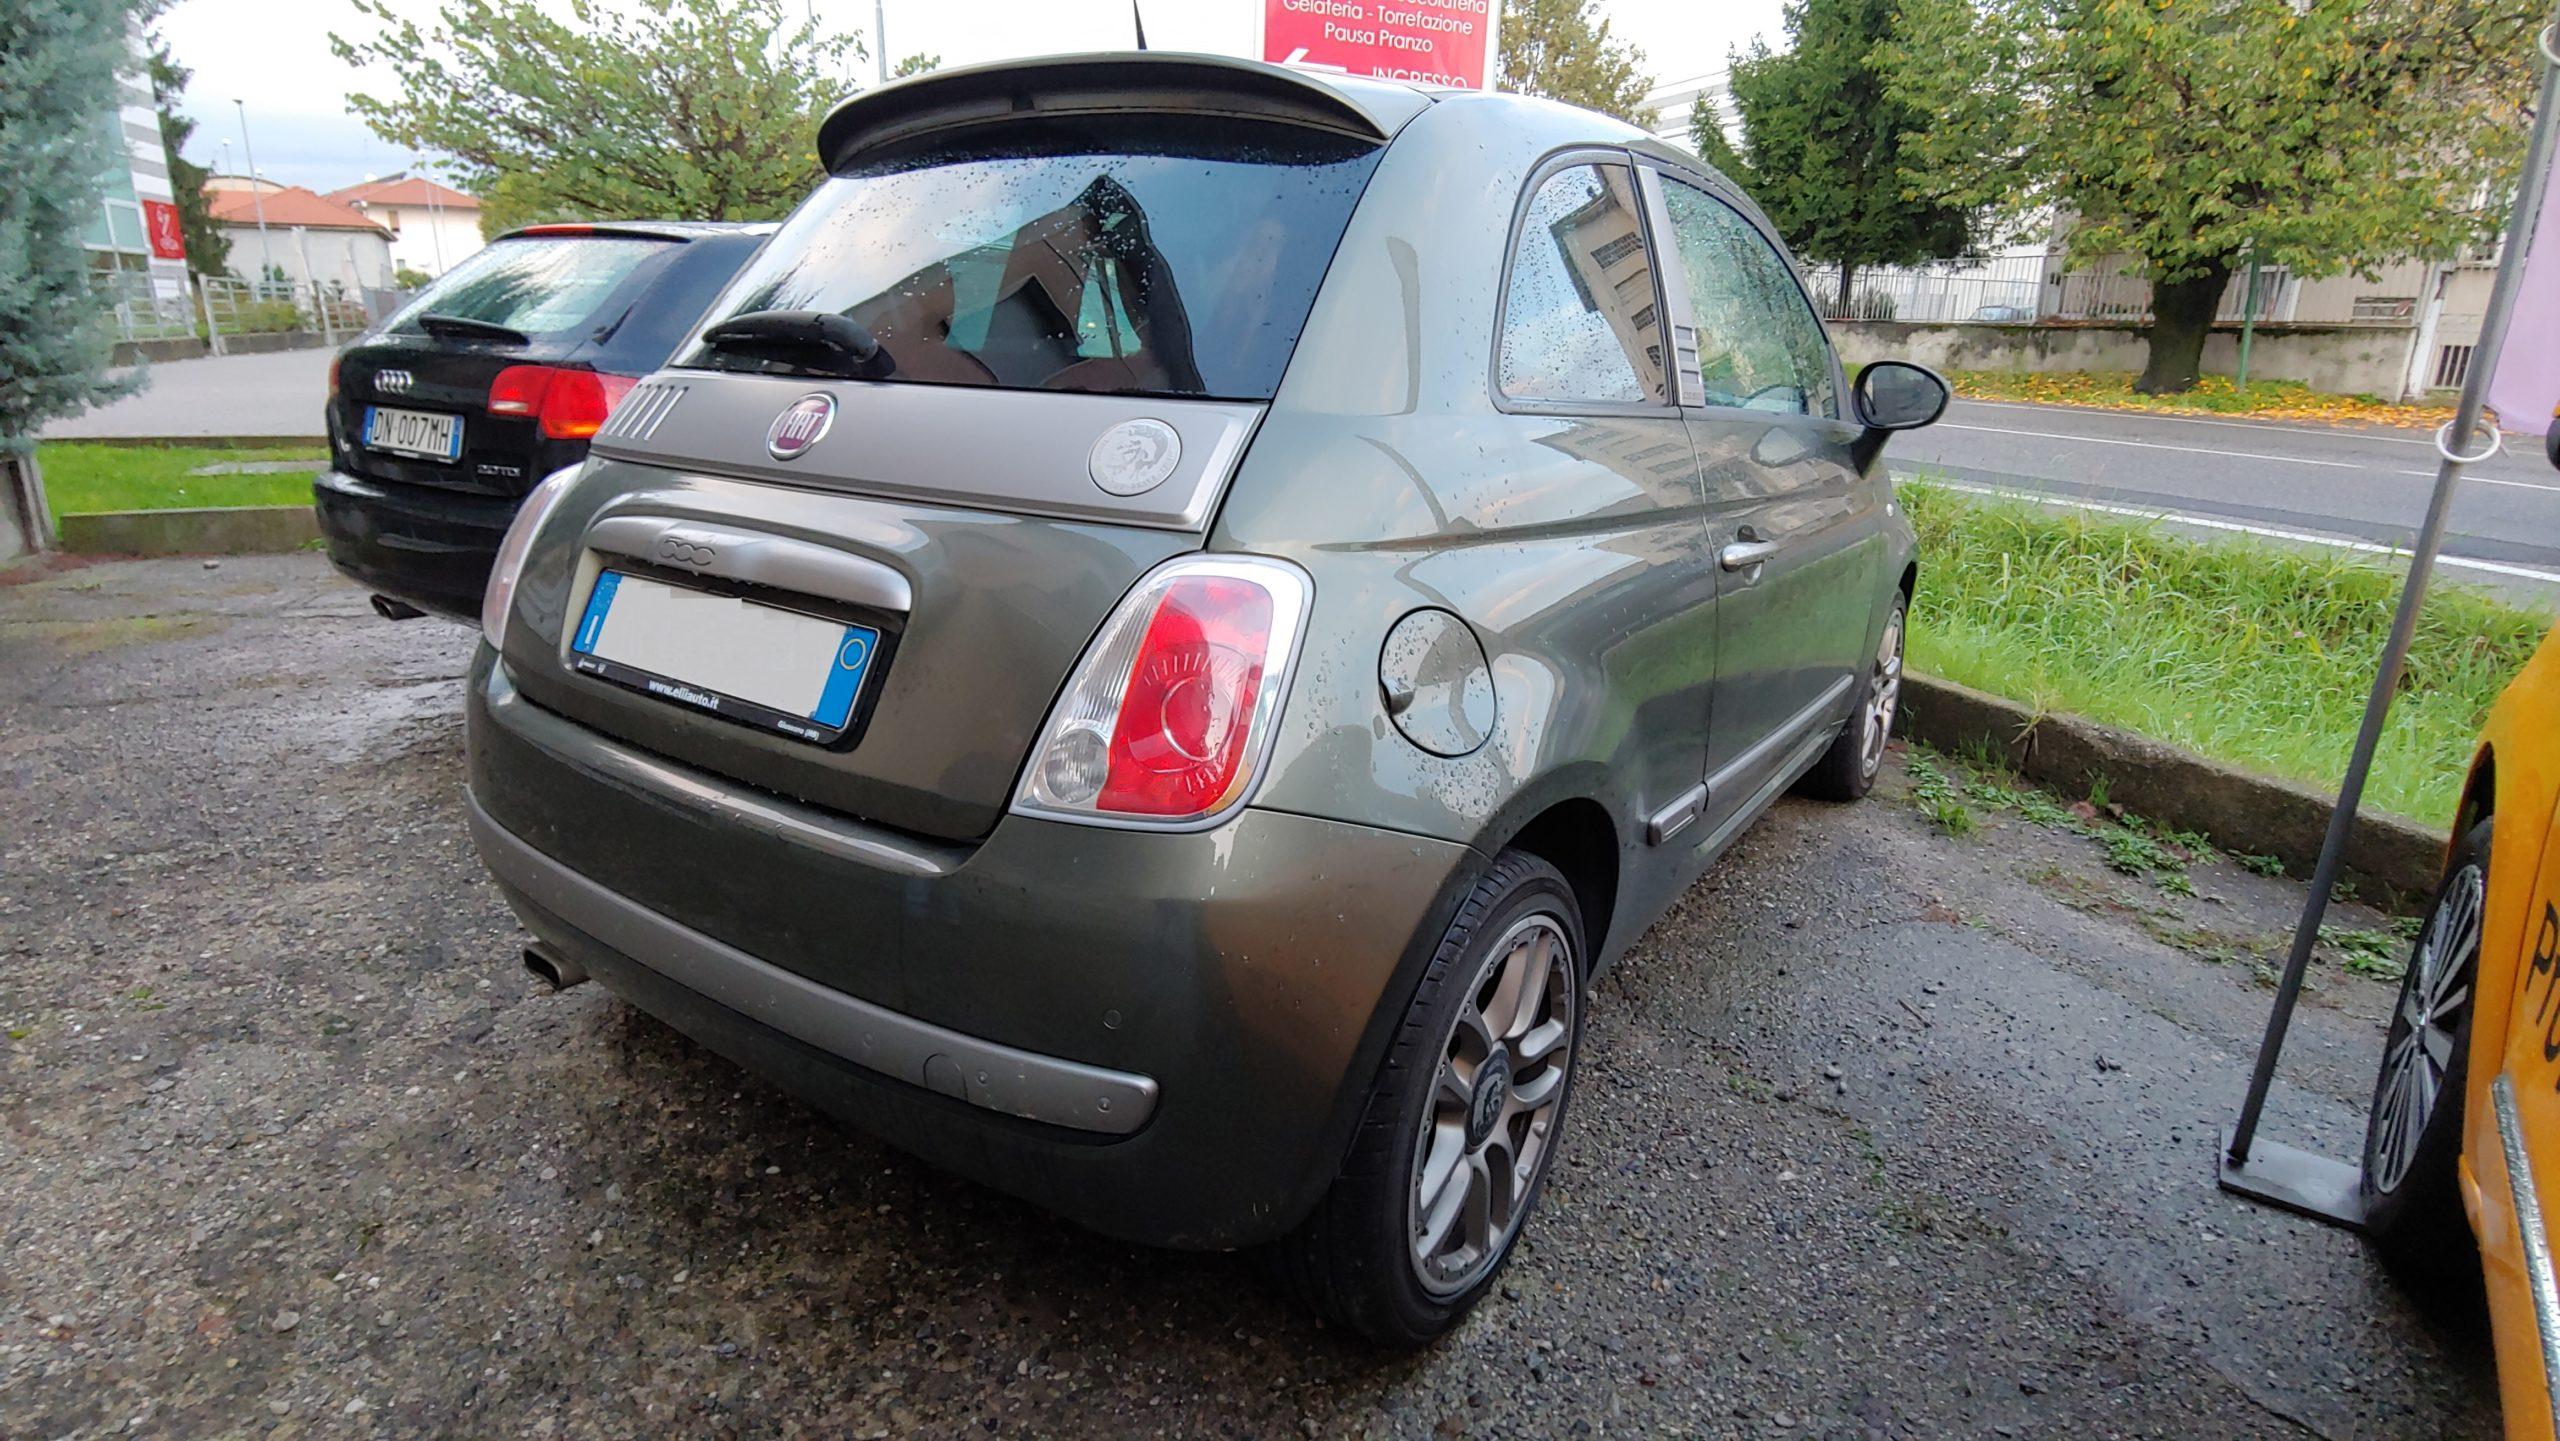 Fiat 500 by diesel 1.3 mjet